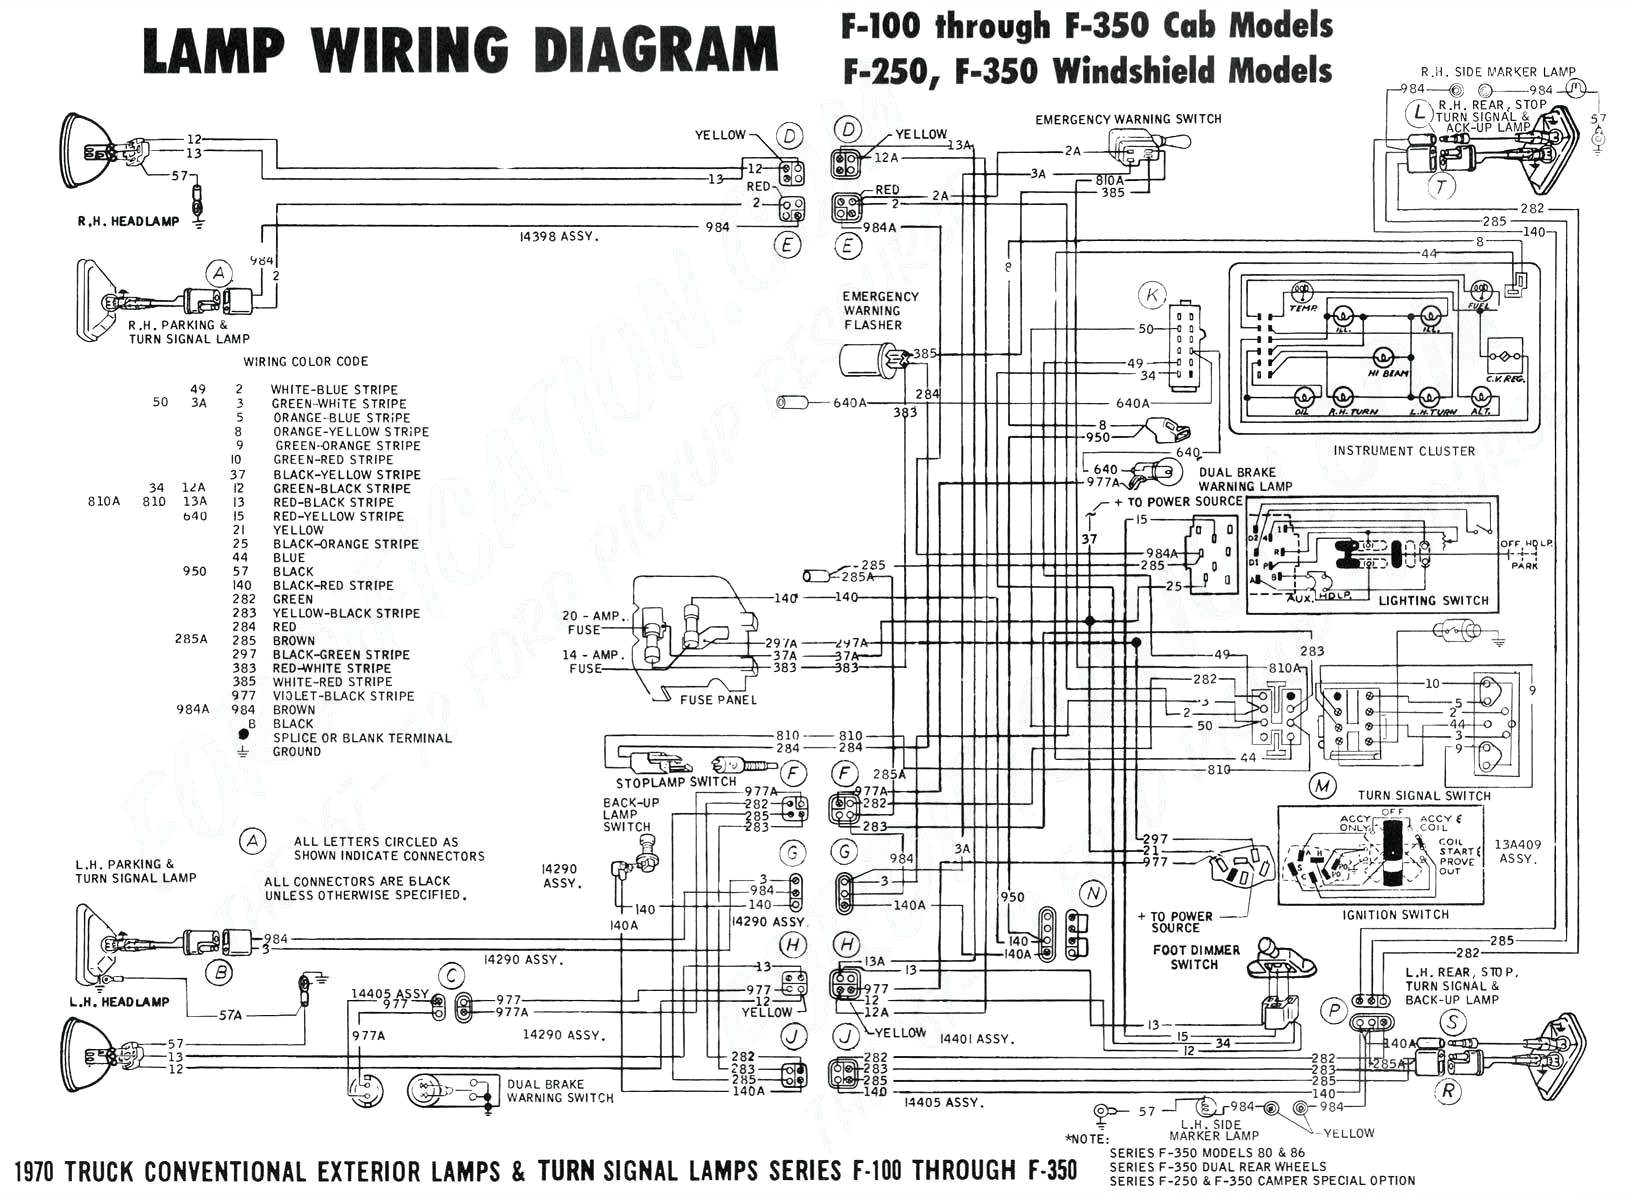 Hot Water Heater Element Wiring Diagram Hot Diagram Water Wiring Heater E82766718 Wiring Diagram Operations